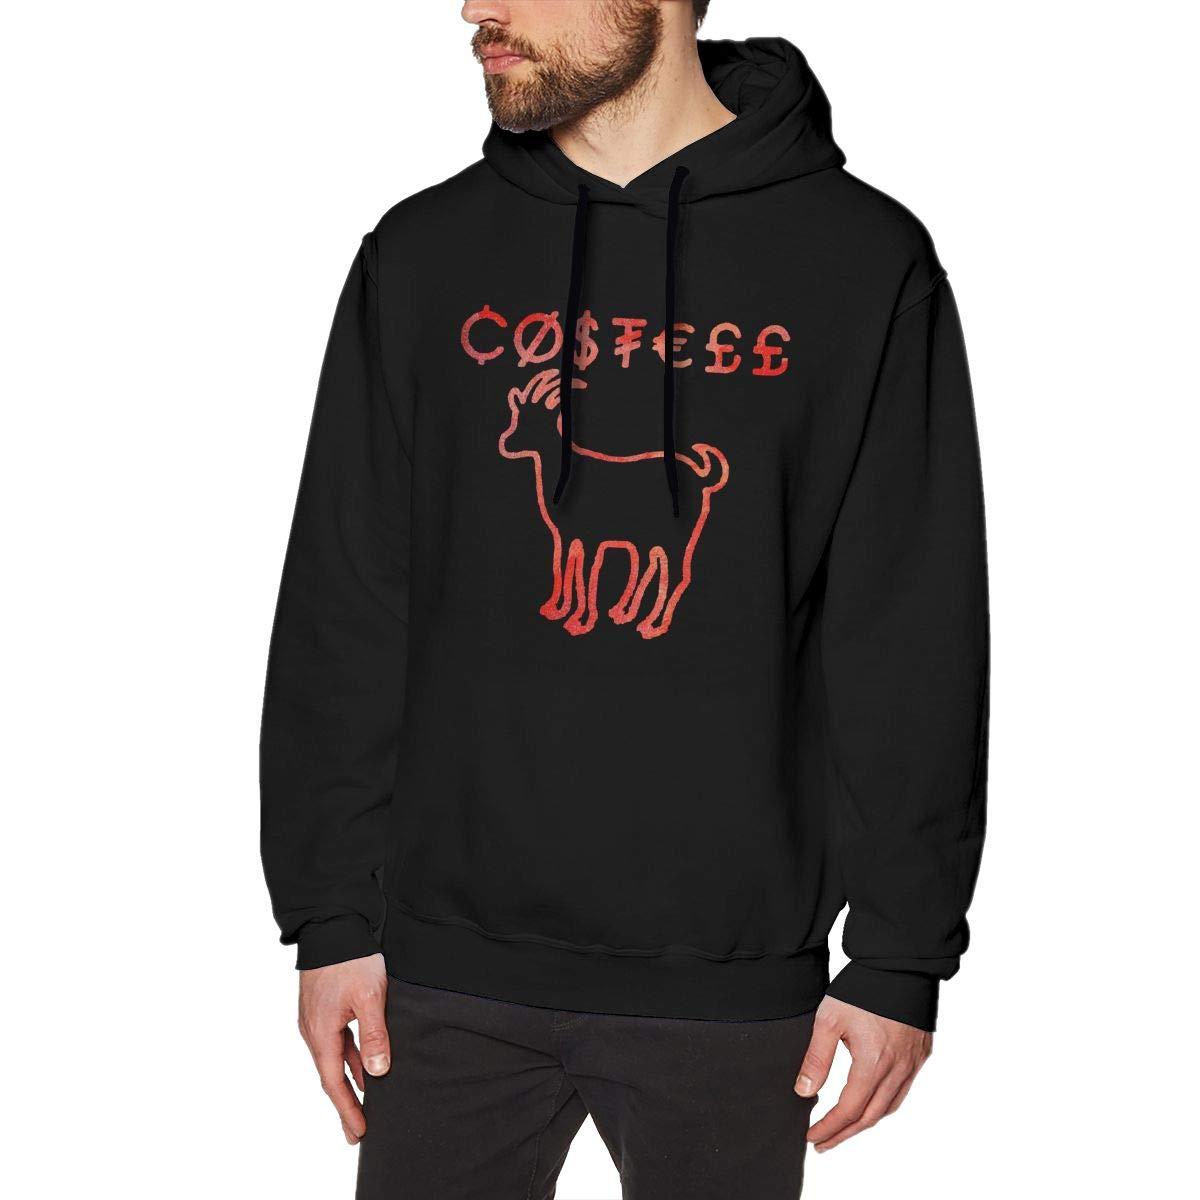 Mens Hooded Sweatshirt Classical Elegance and Originality Erika Costell Logo Black 3XL